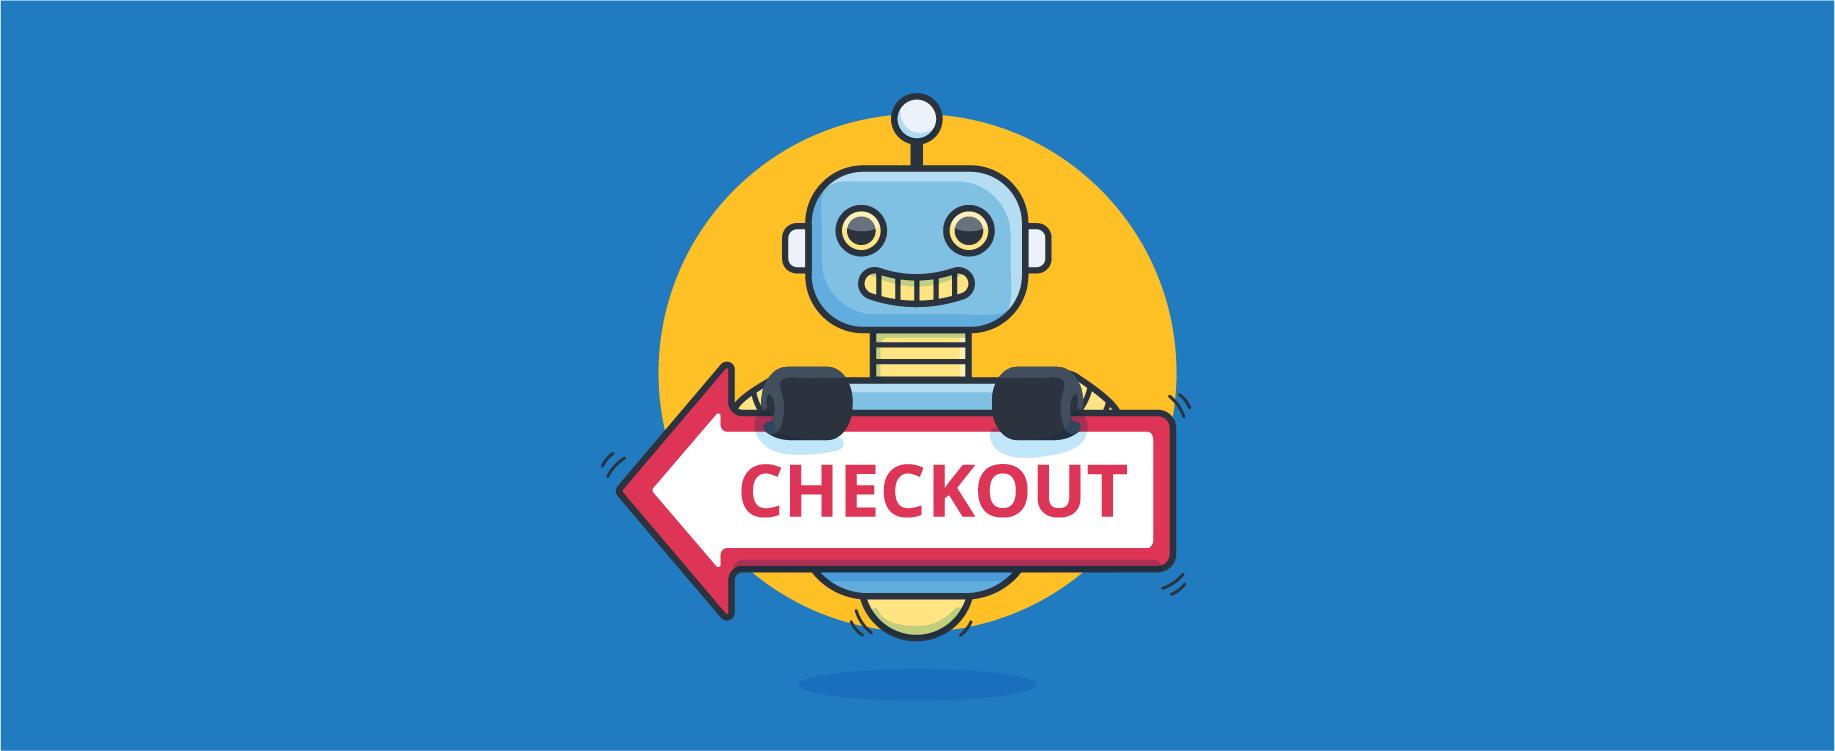 chatbot holding checkout sign - header image for 4 Steps for Creating Compelling Chatbot Funnels